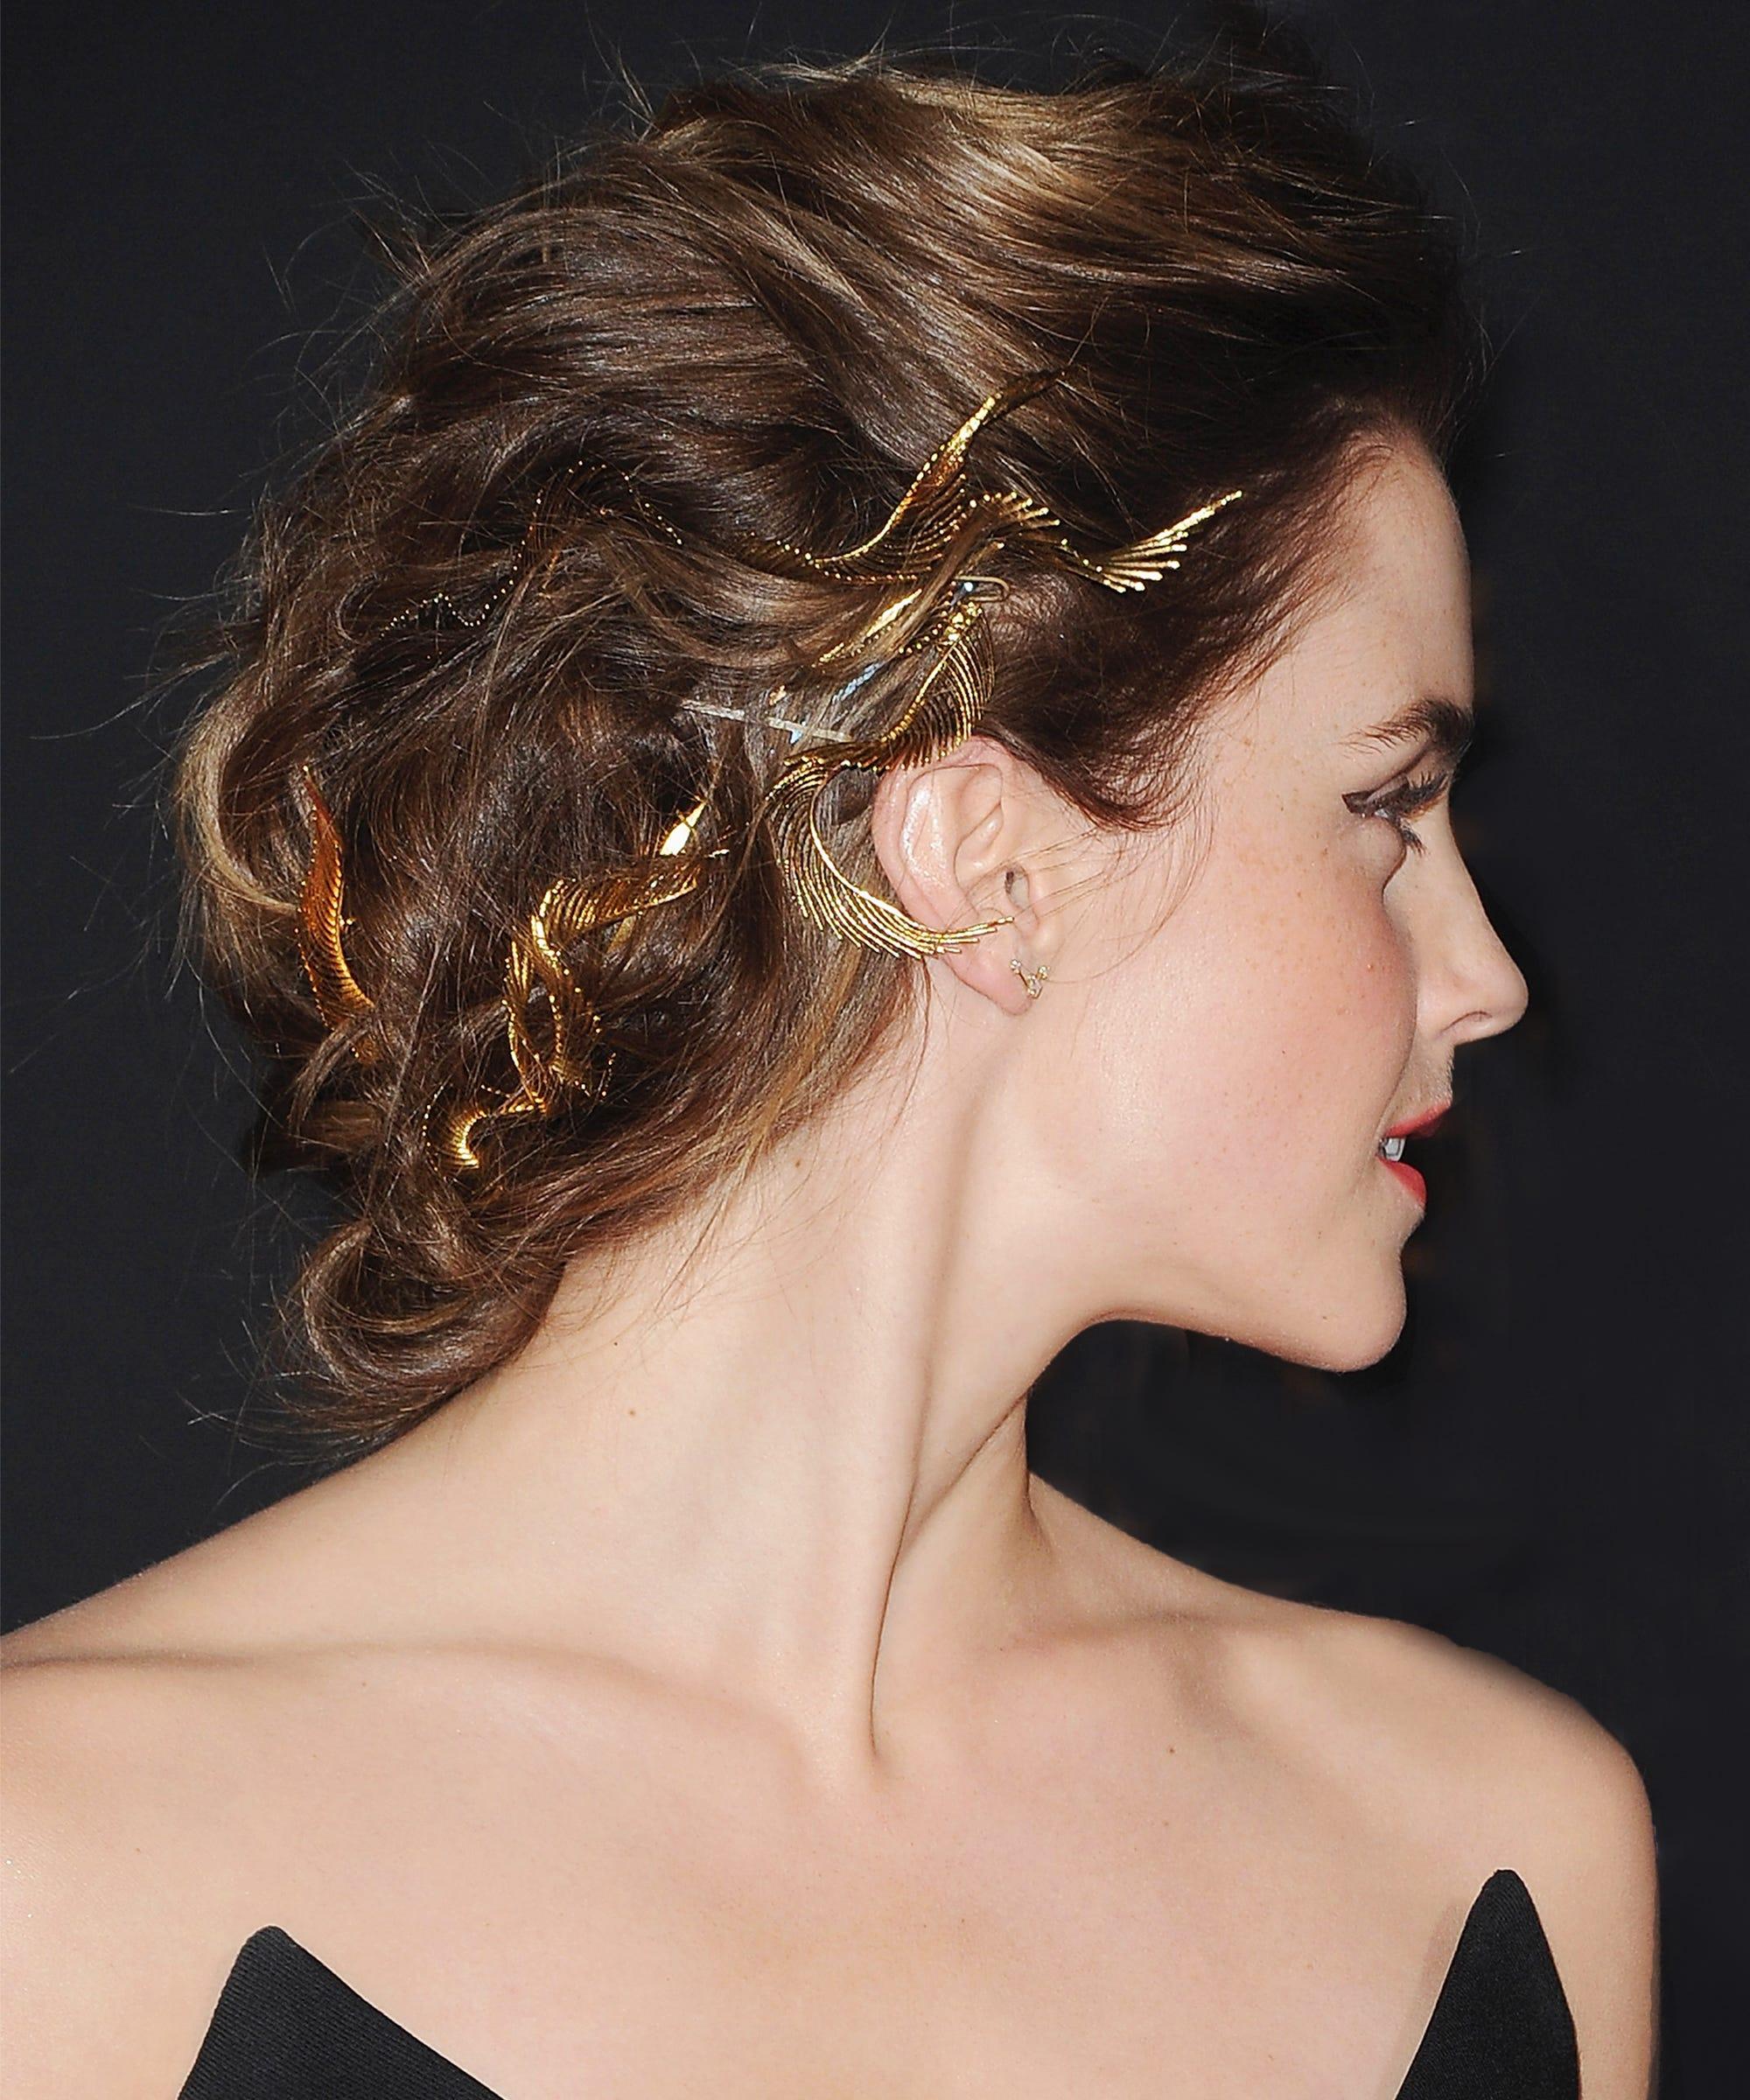 Emma Watson Beauty And The Beast Harry Potter Hair